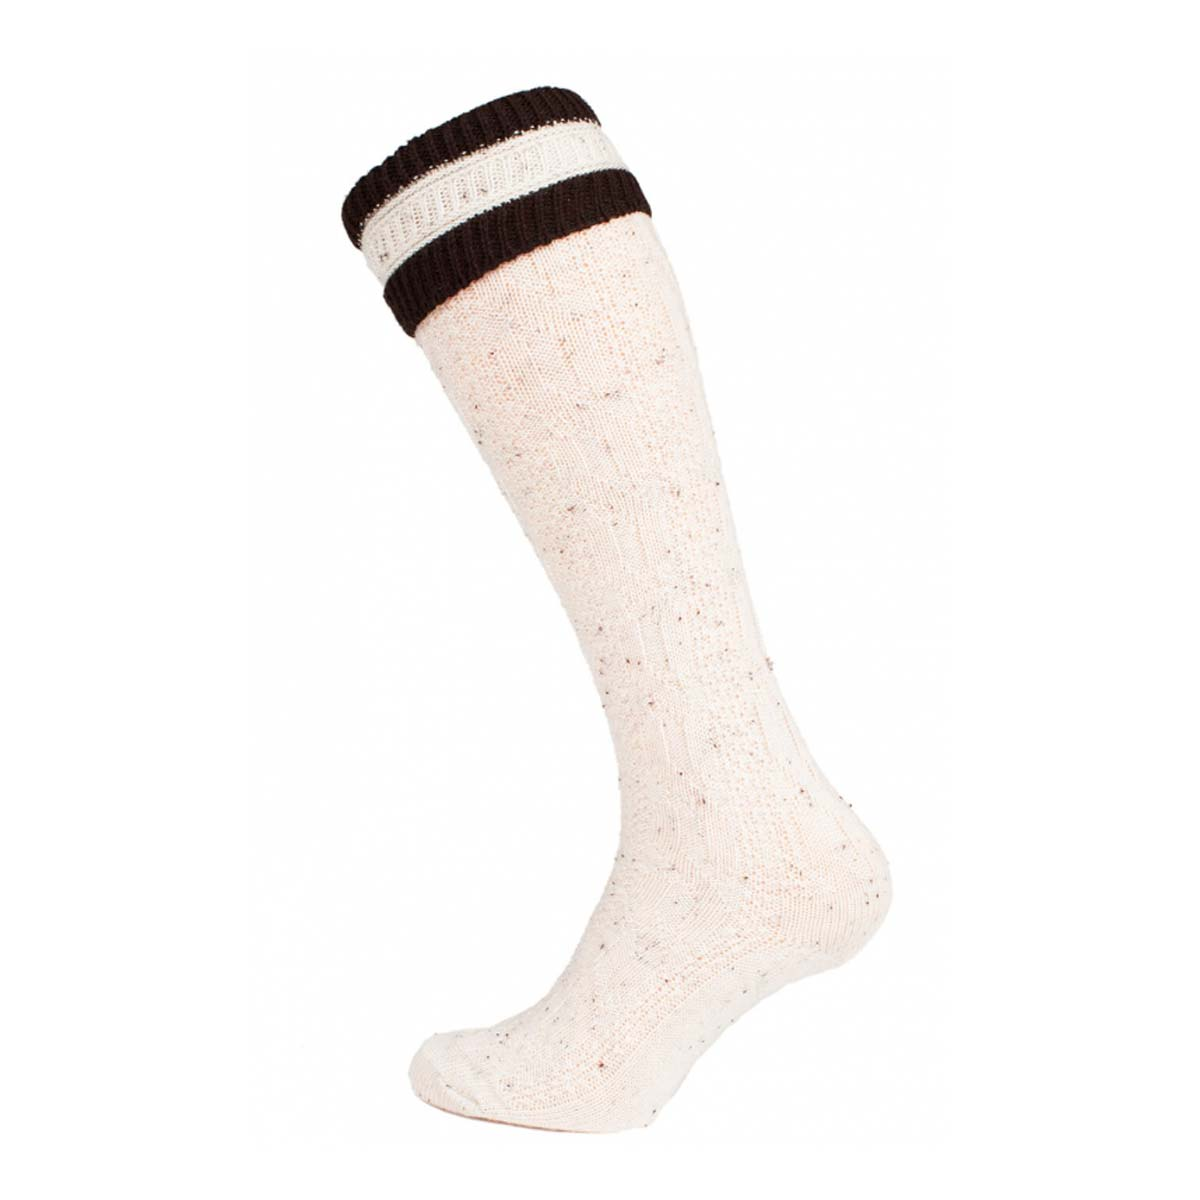 HALF WHITE SOCKS WITH DARK BROWN LINES